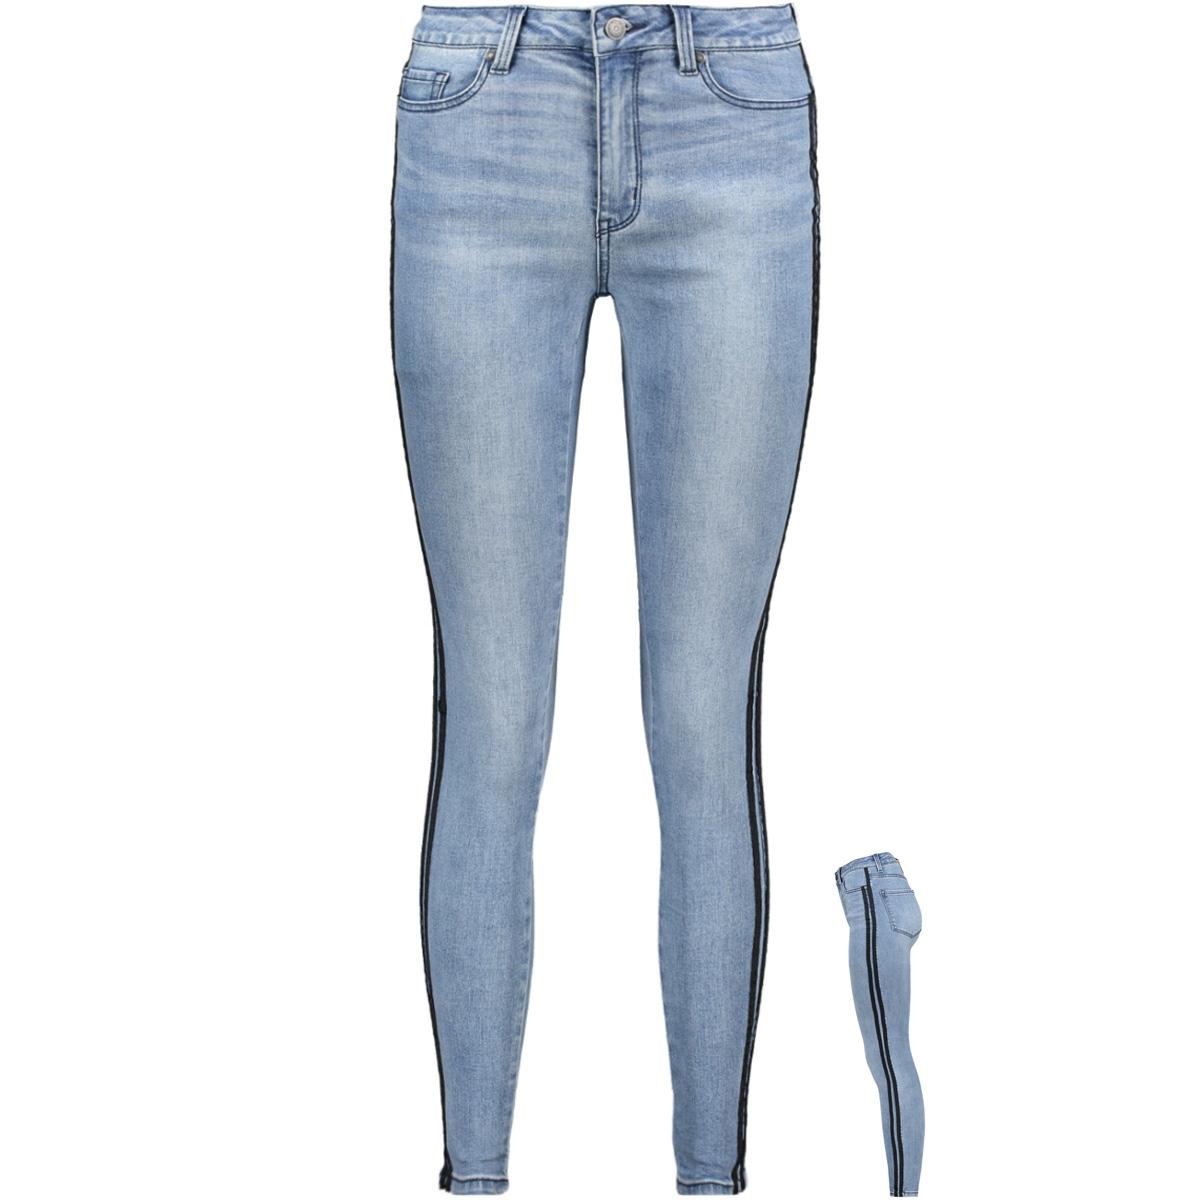 349396e19bbe objskinnykatie stripe oxi185 101 23028664 object jeans light blue  deni stripes do